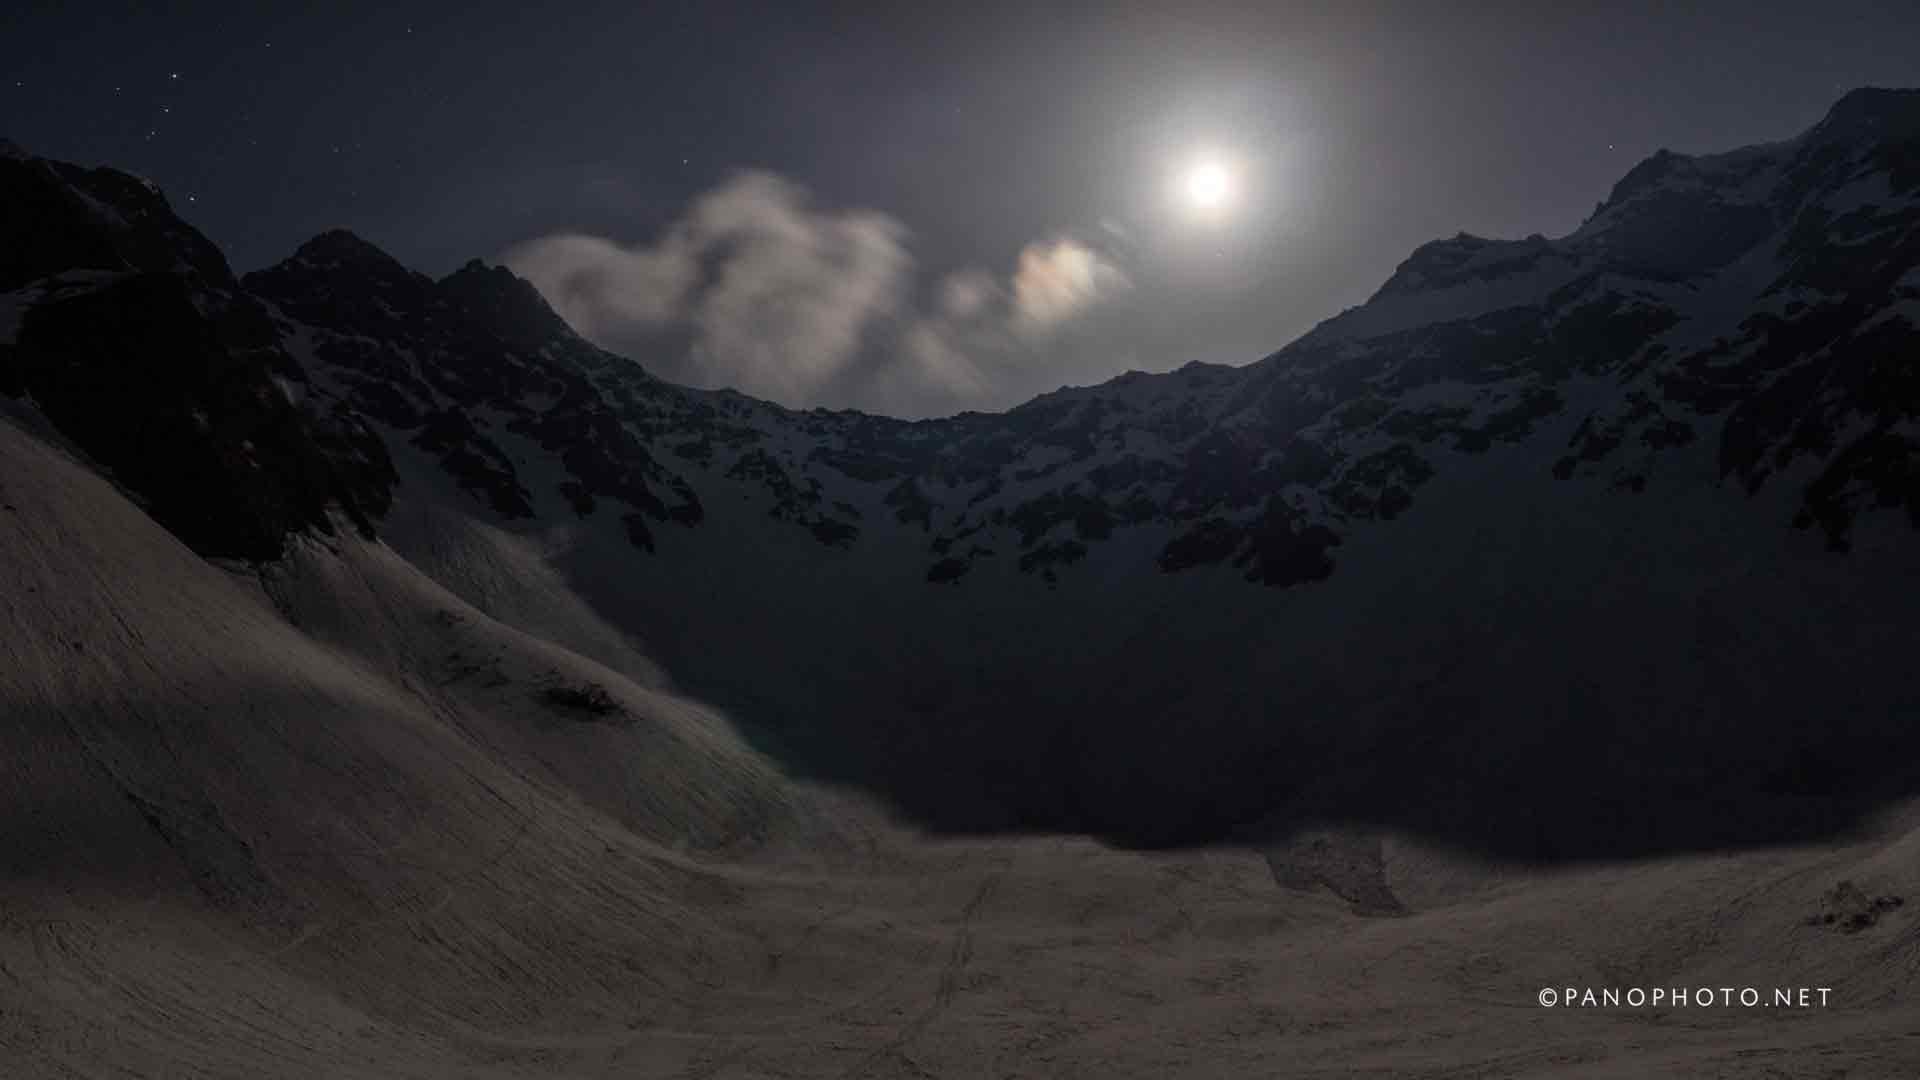 Tsurione moonset view from Karasawa Hut Tent Vilage | Panasonic LUMIX DMC-GH4 + Panasonic LUMIX G X VARIO 12-35mm F2.8 ASPH. POWER O.I.S.